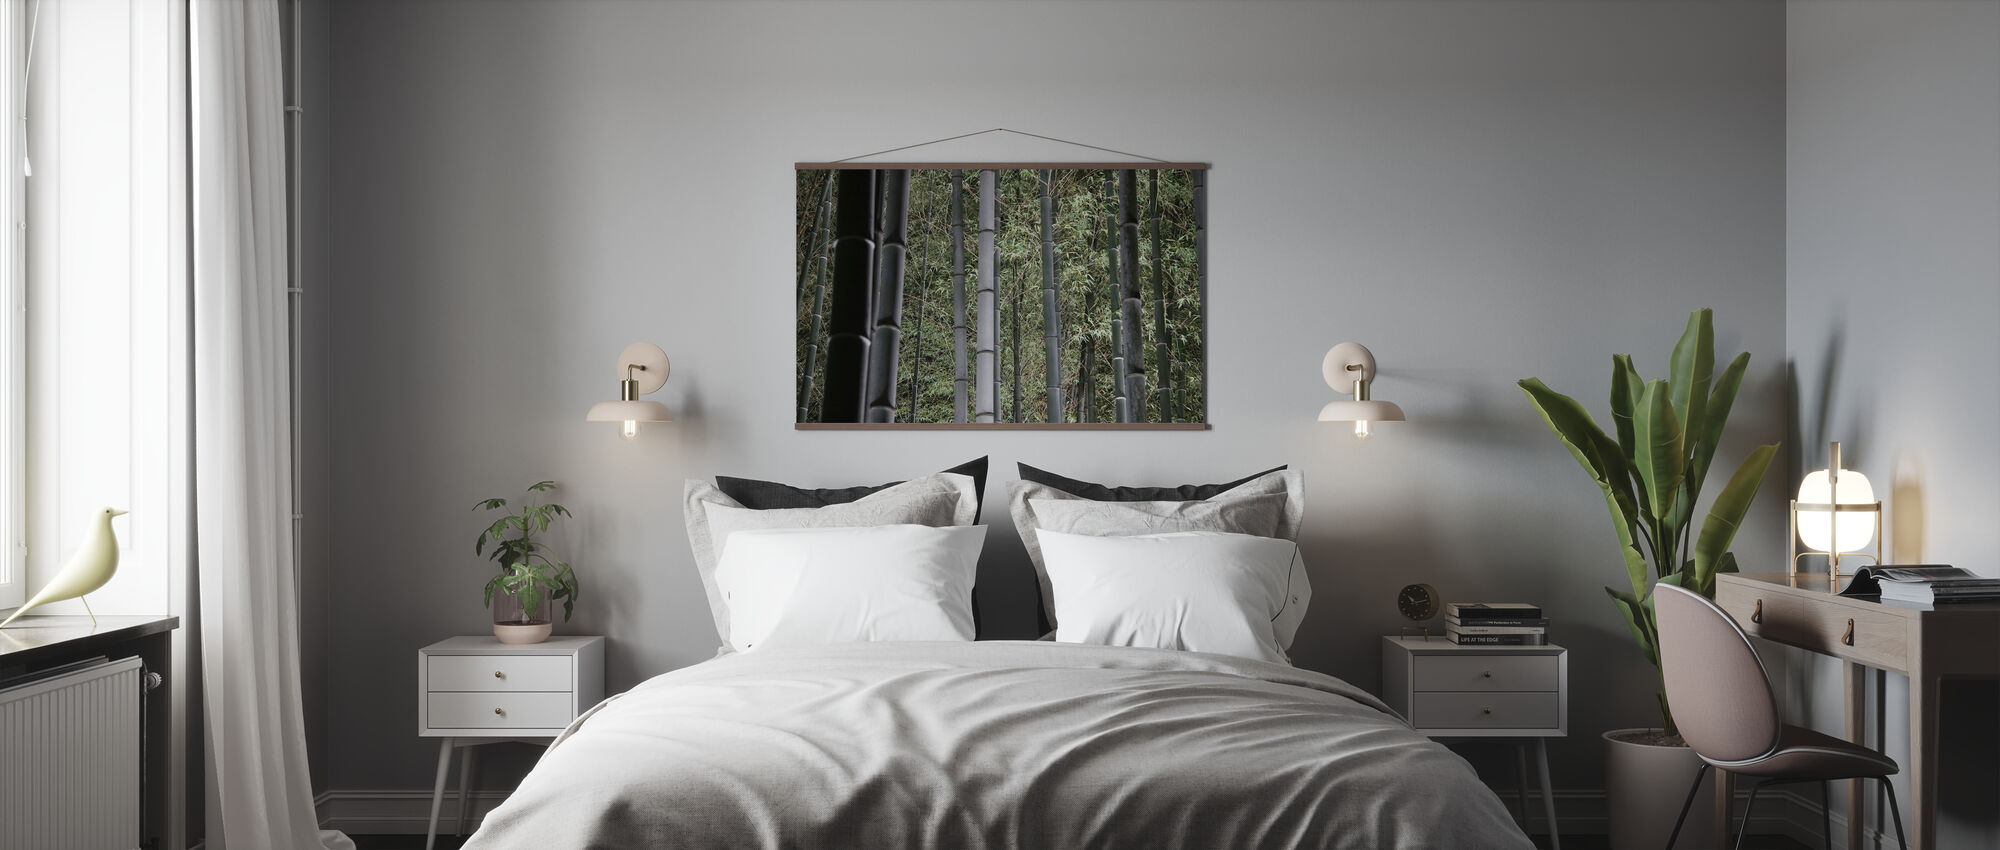 Bambus skov om natten - Plakat - Soverom